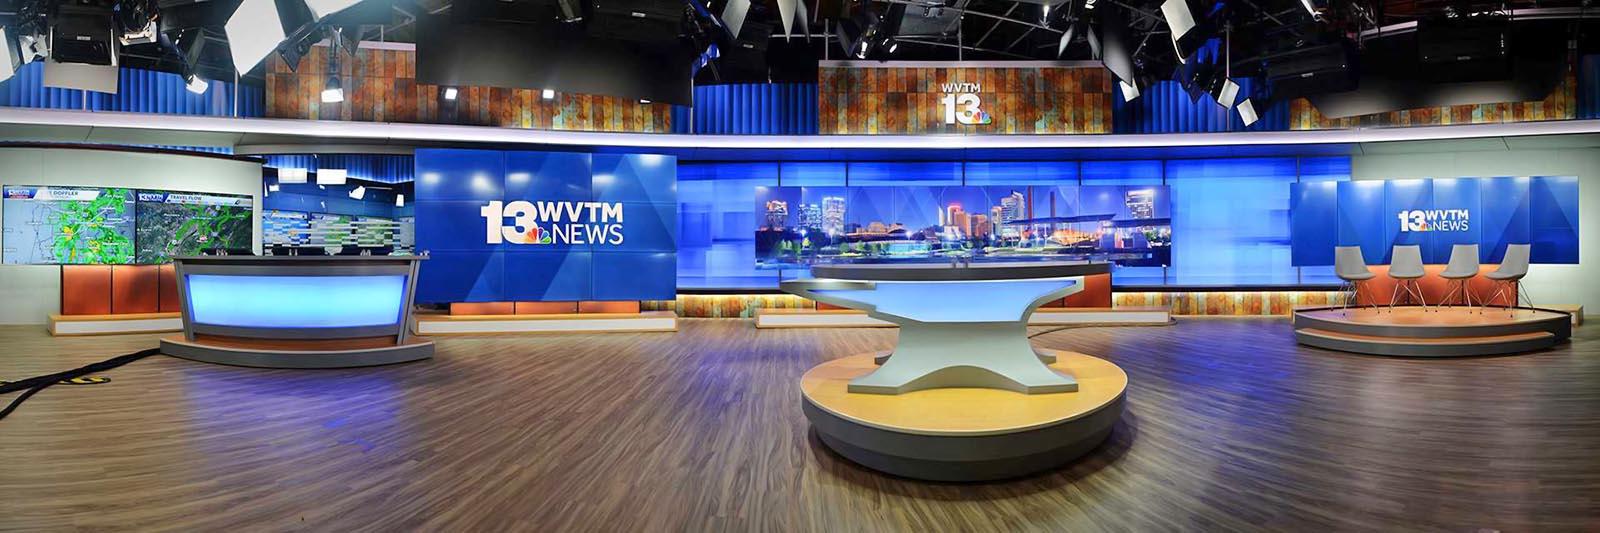 WVTM 13 News live streaming studio